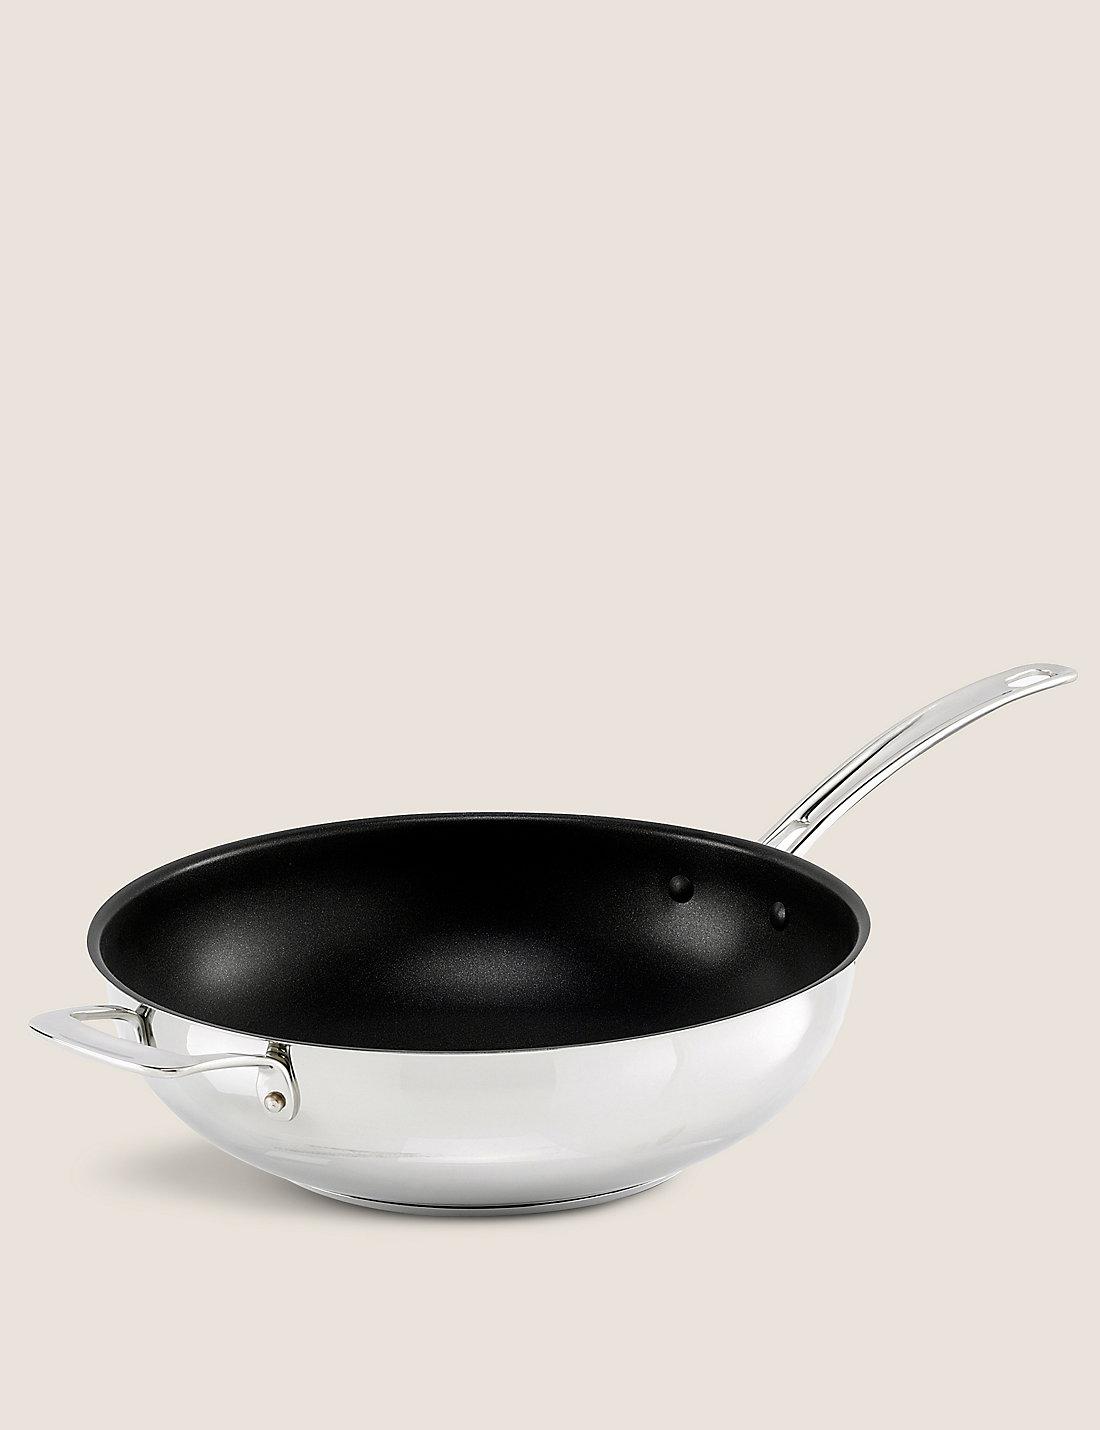 30cm stainless steel wok